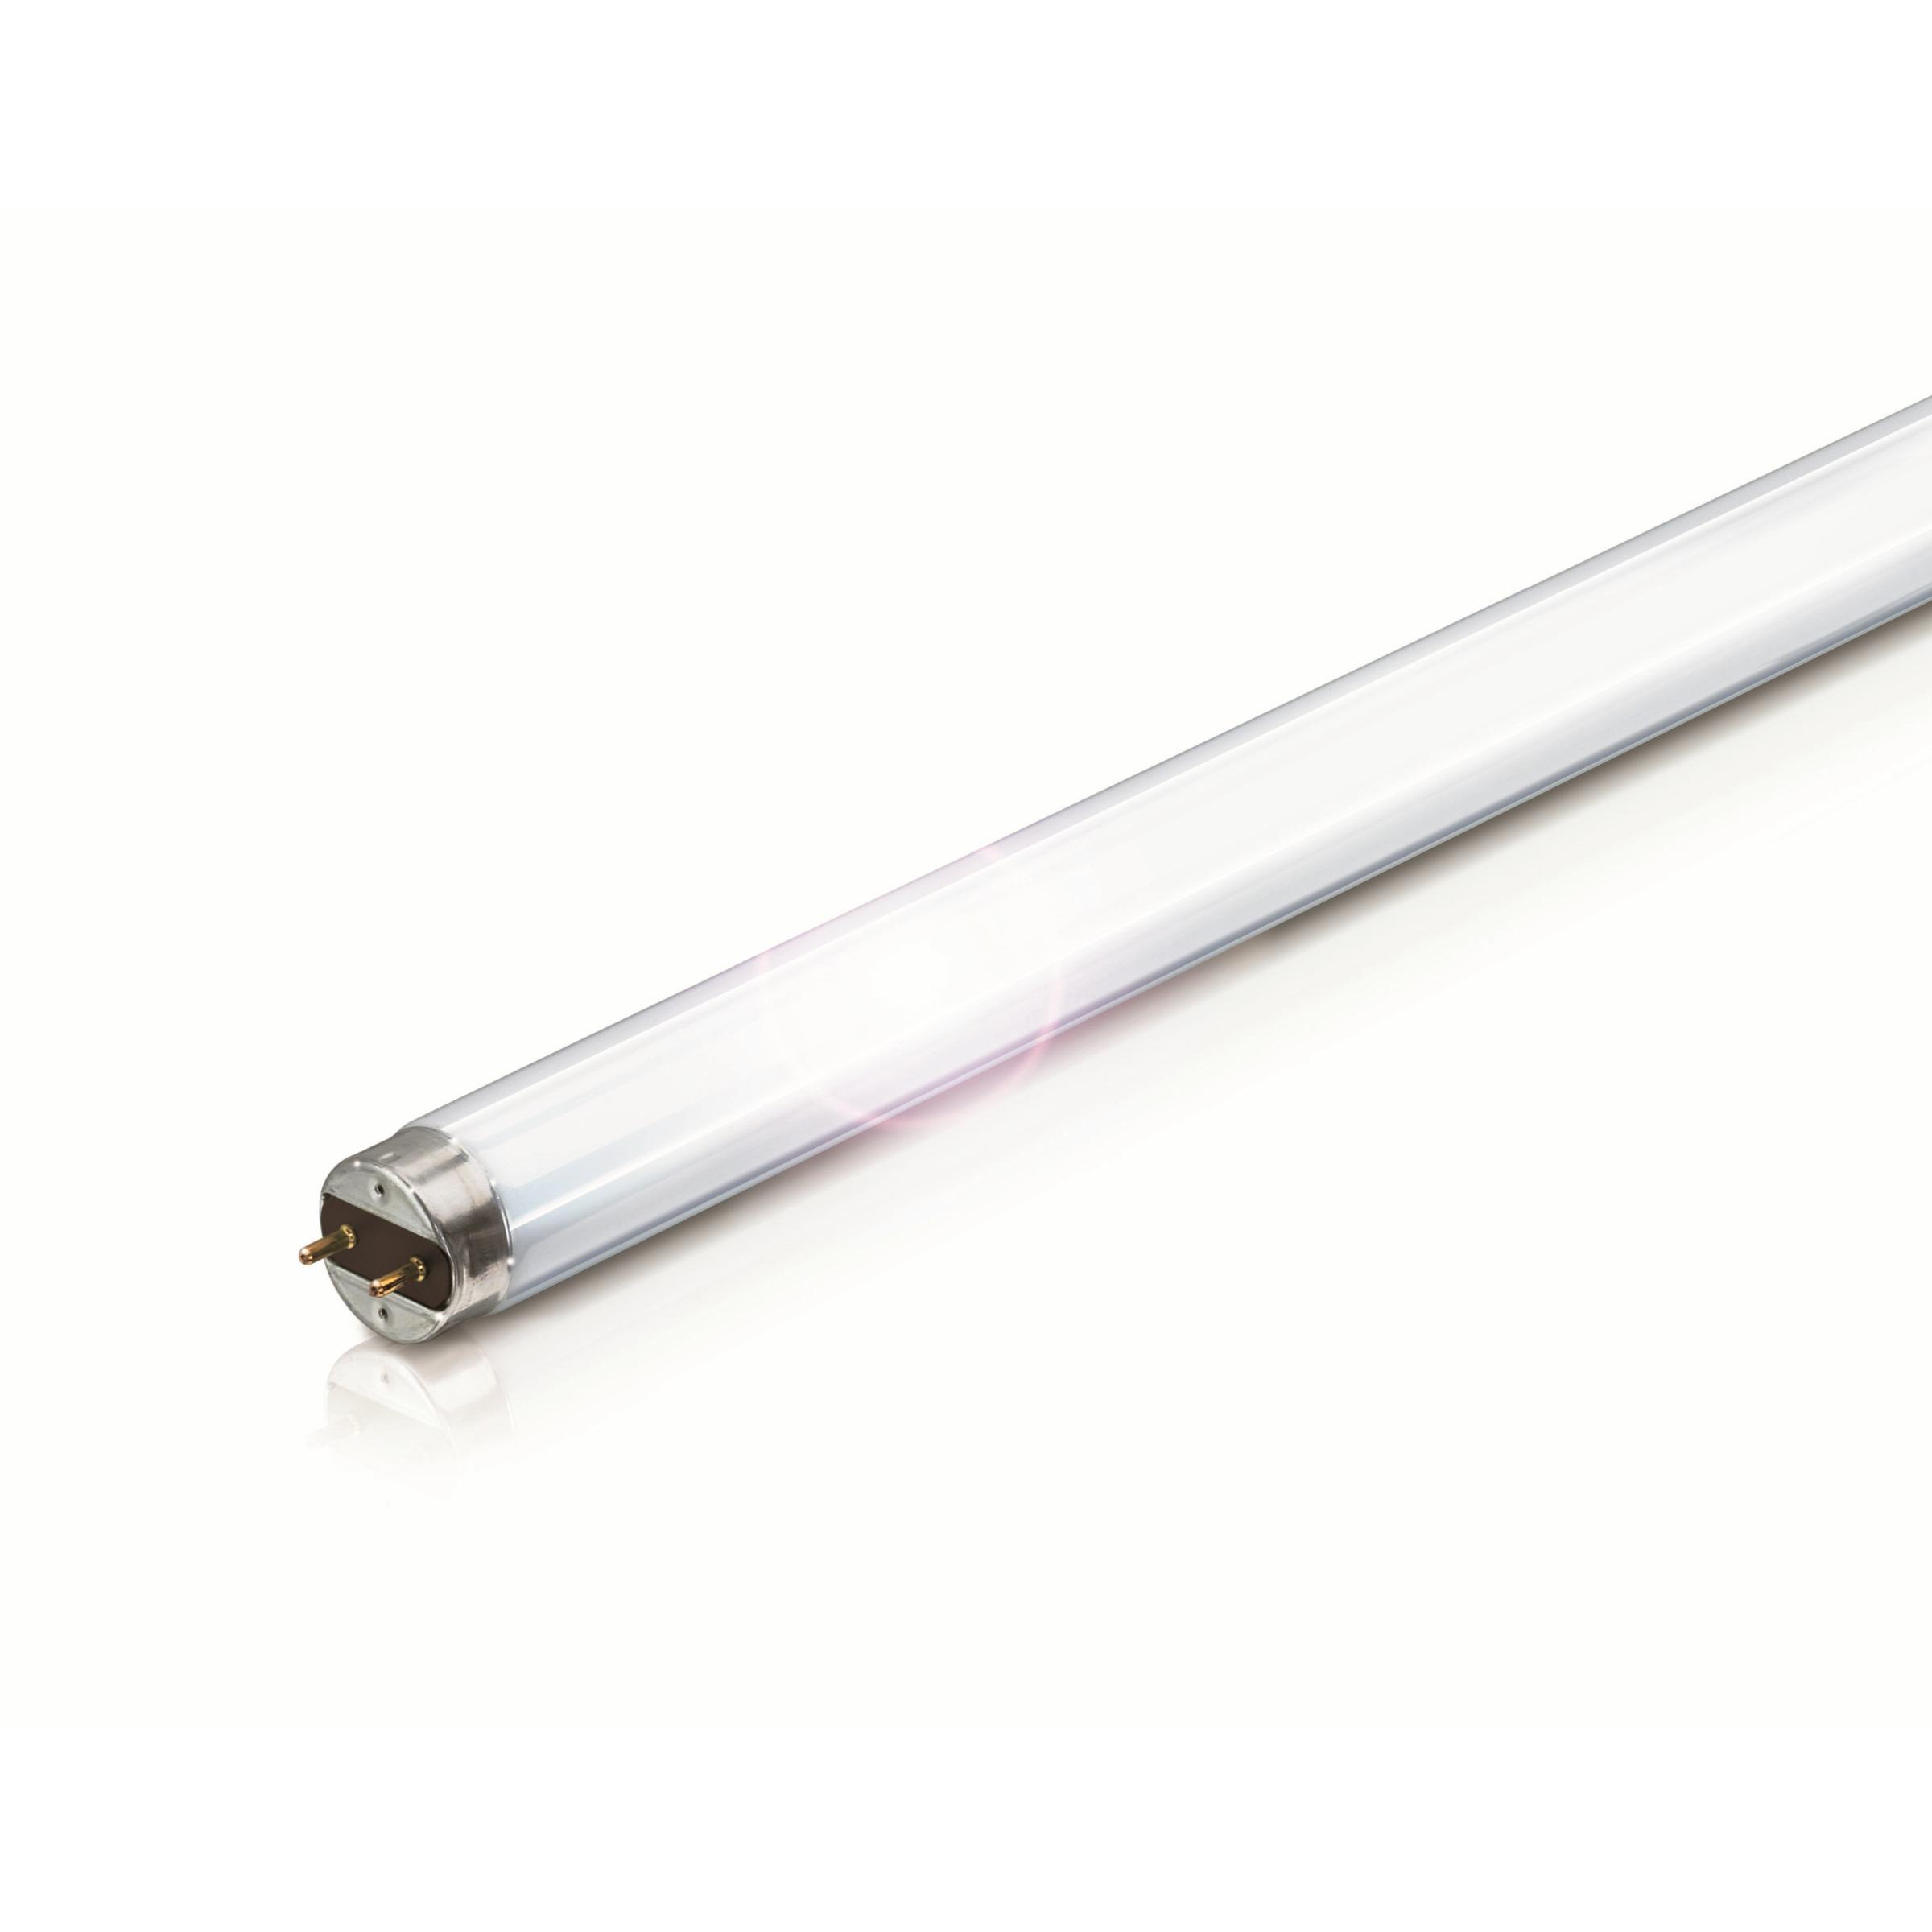 Philips TL-D buis 36W warmwit 120 cm